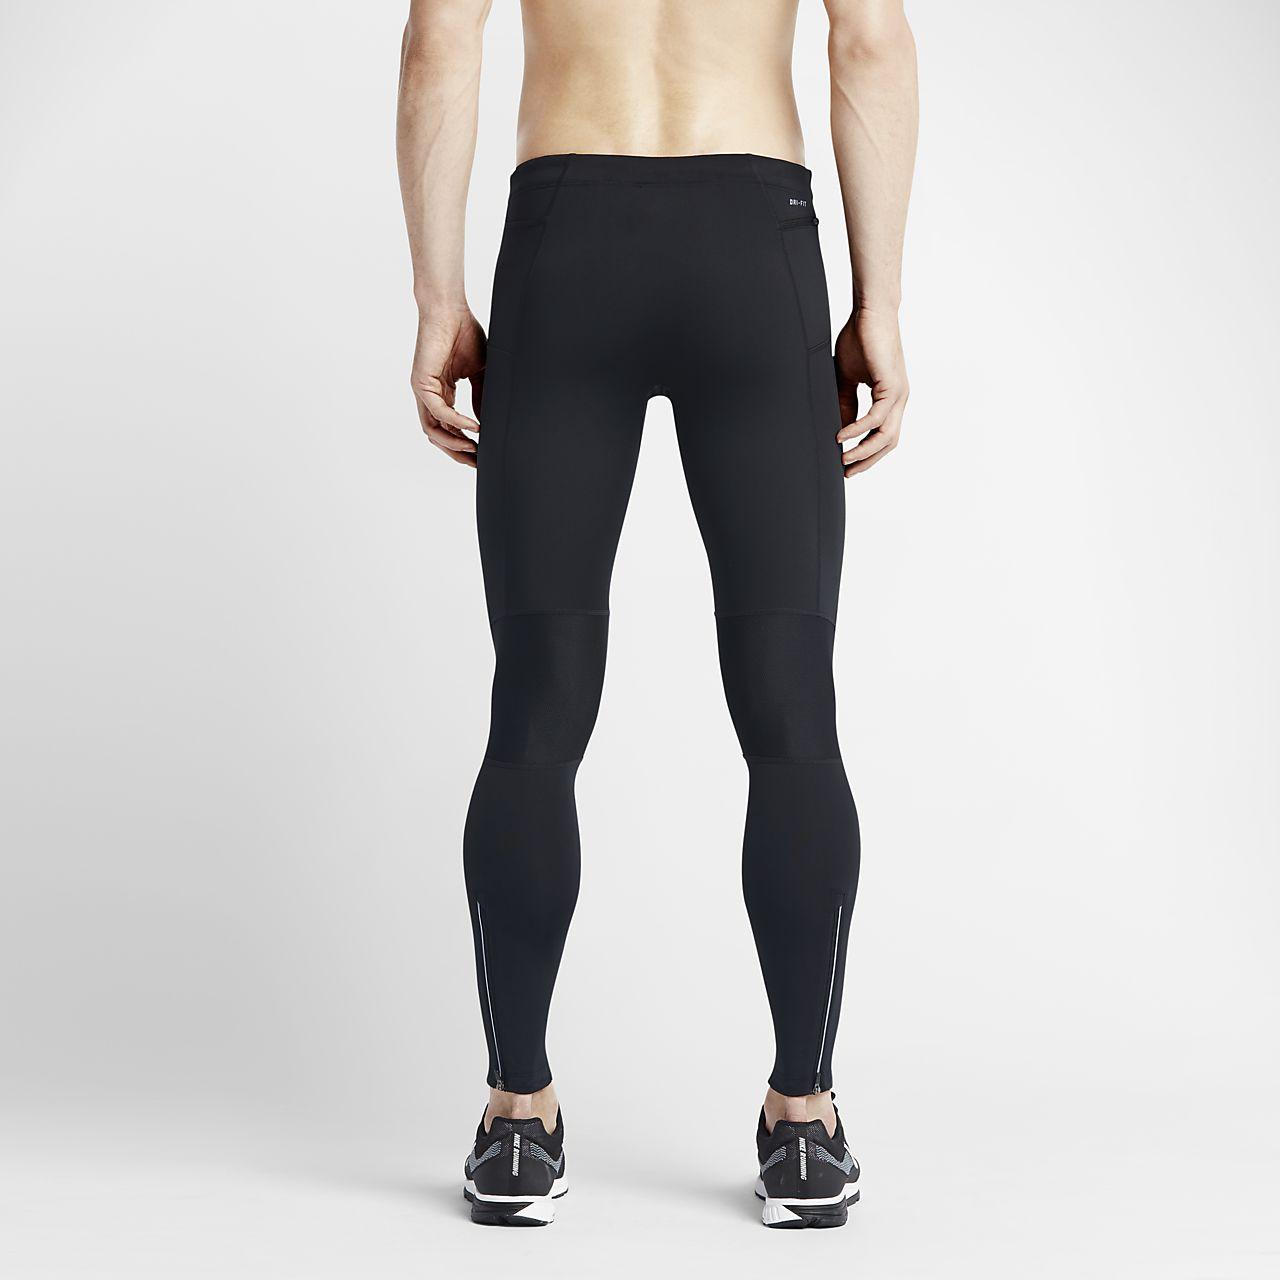 0f1b8c9506f3b Nike Power Tech Men's Running Tights. Nike.com CA